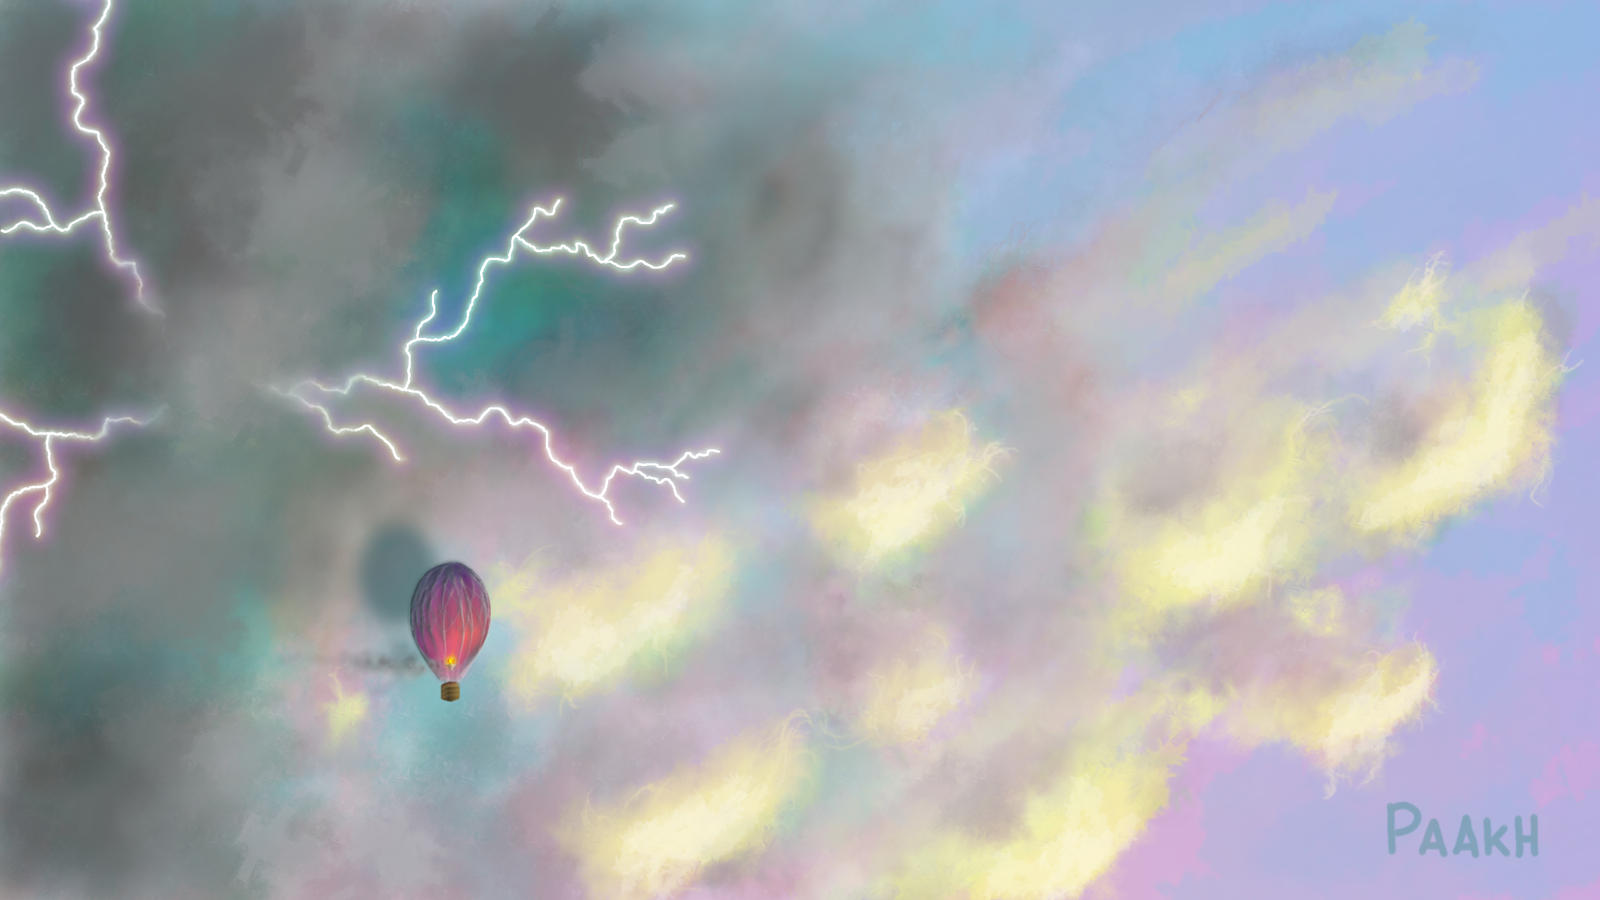 Ballooning by Kajenx